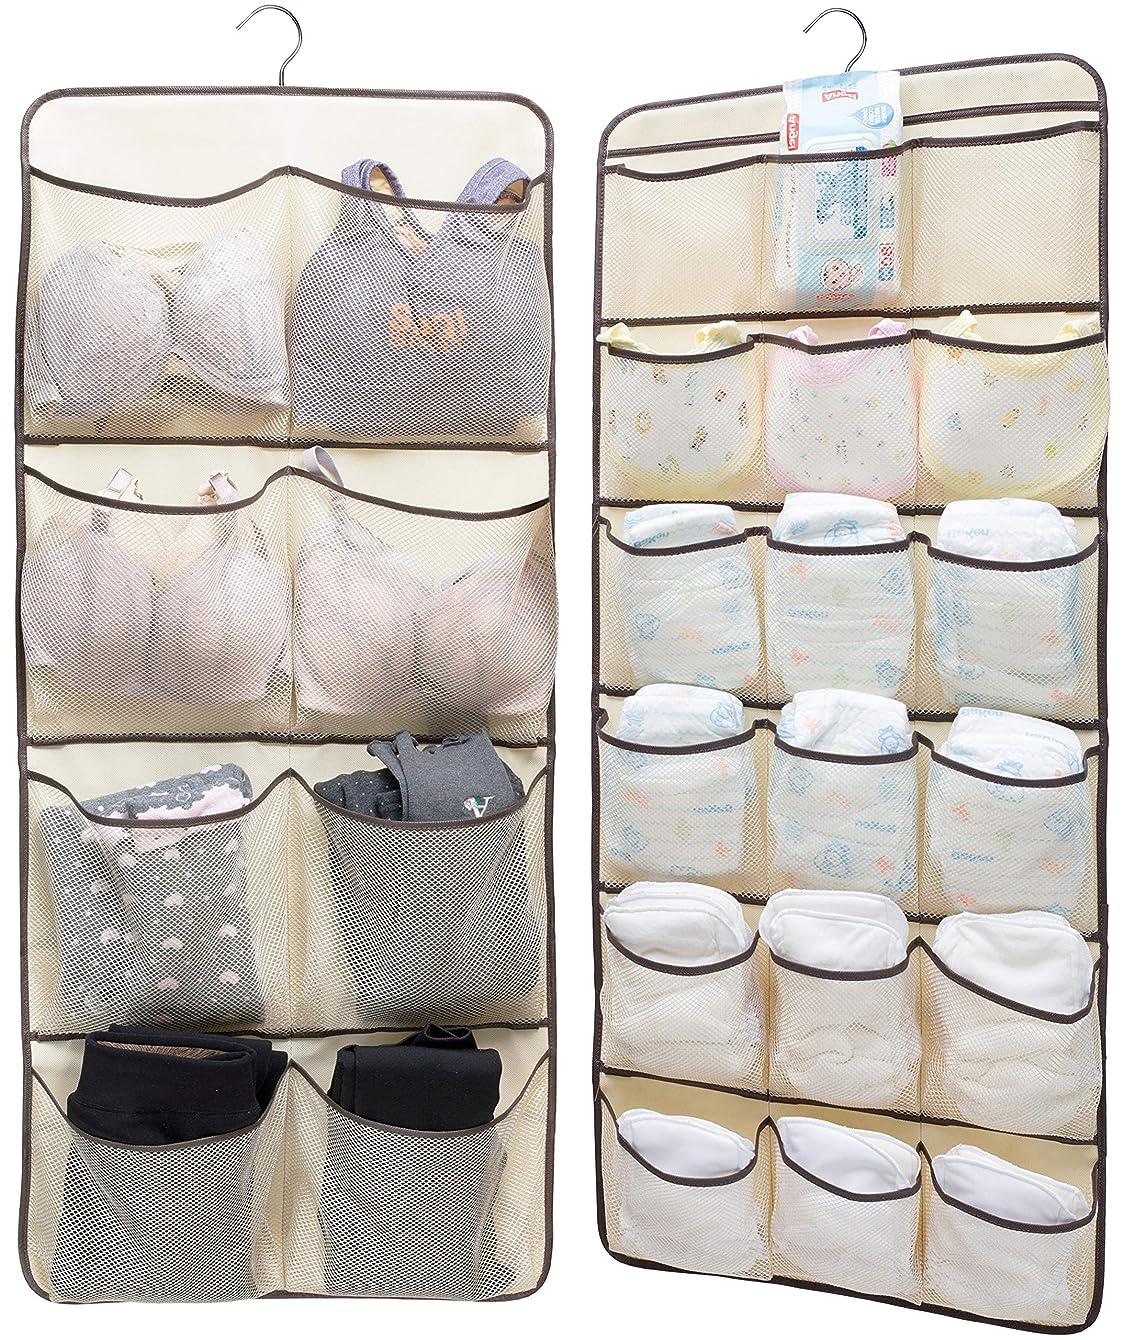 Sleeping Lamb Dual-Sided Hanging Closet Organizer for Underwear, Stocking, Toiletries Accessories, Bra, Sock, 26 Mesh Pockets & Rotating Metal Hanger, Beige